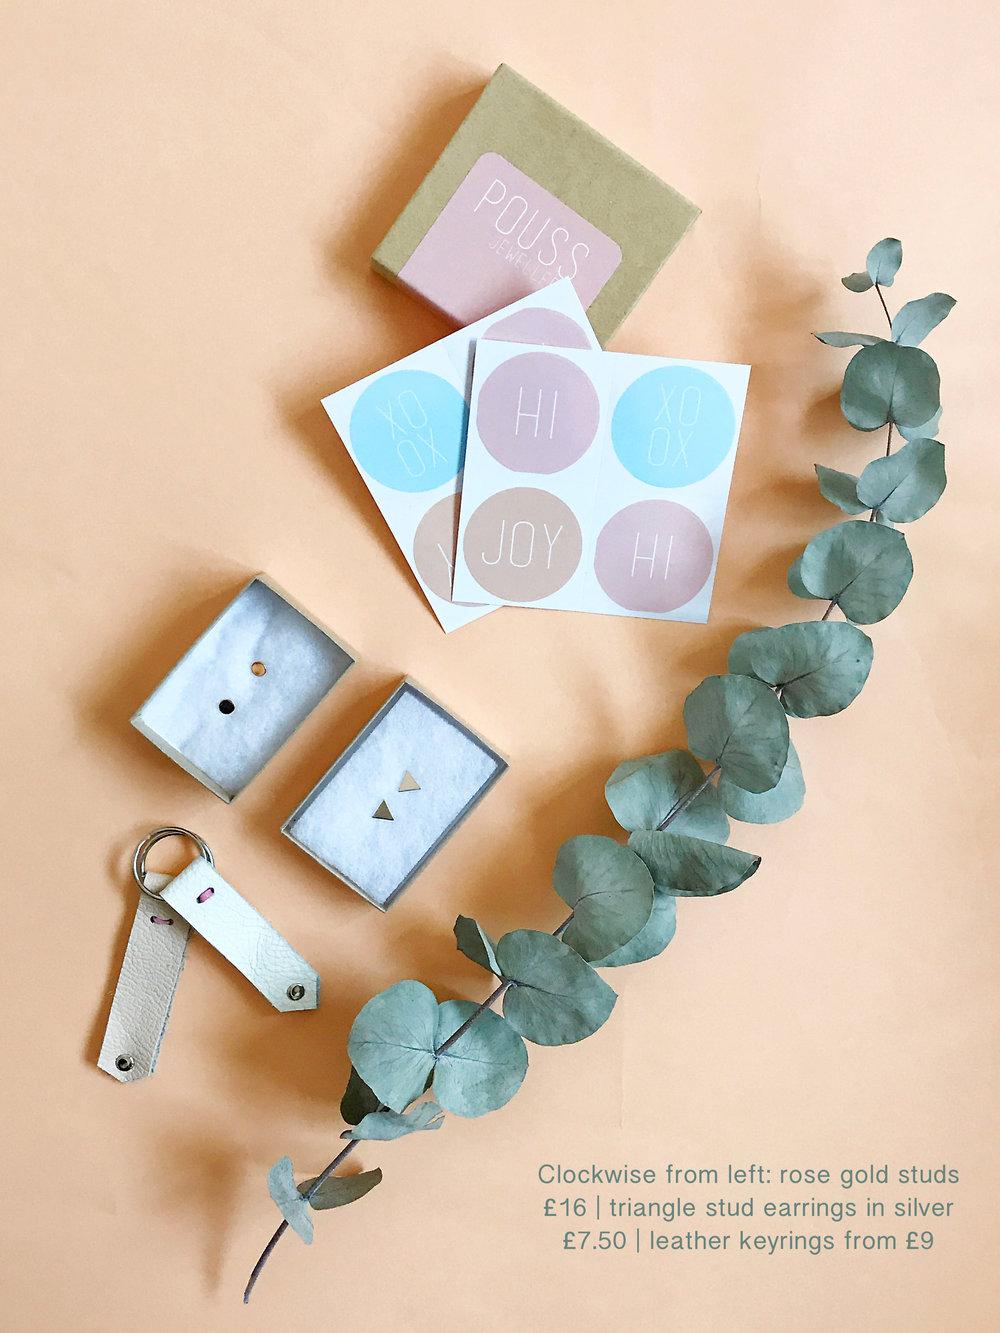 Christmas gift guide pouss peach jewellery flatlay.jpg